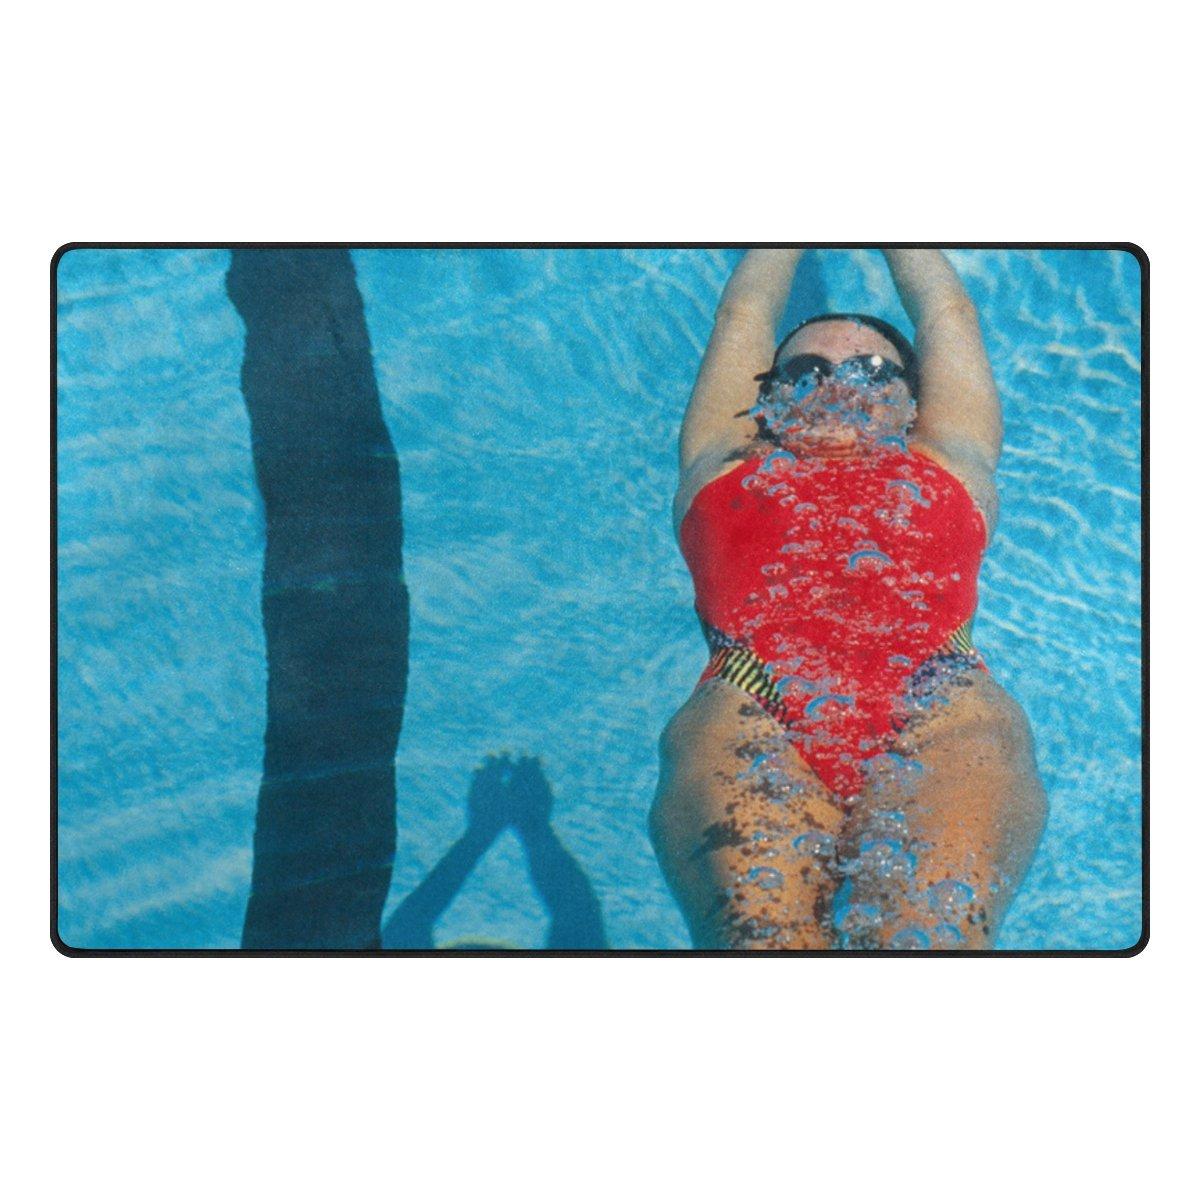 LEEZONE Women's Diving Swimming Printing Rectangle Floor Mat Carpet